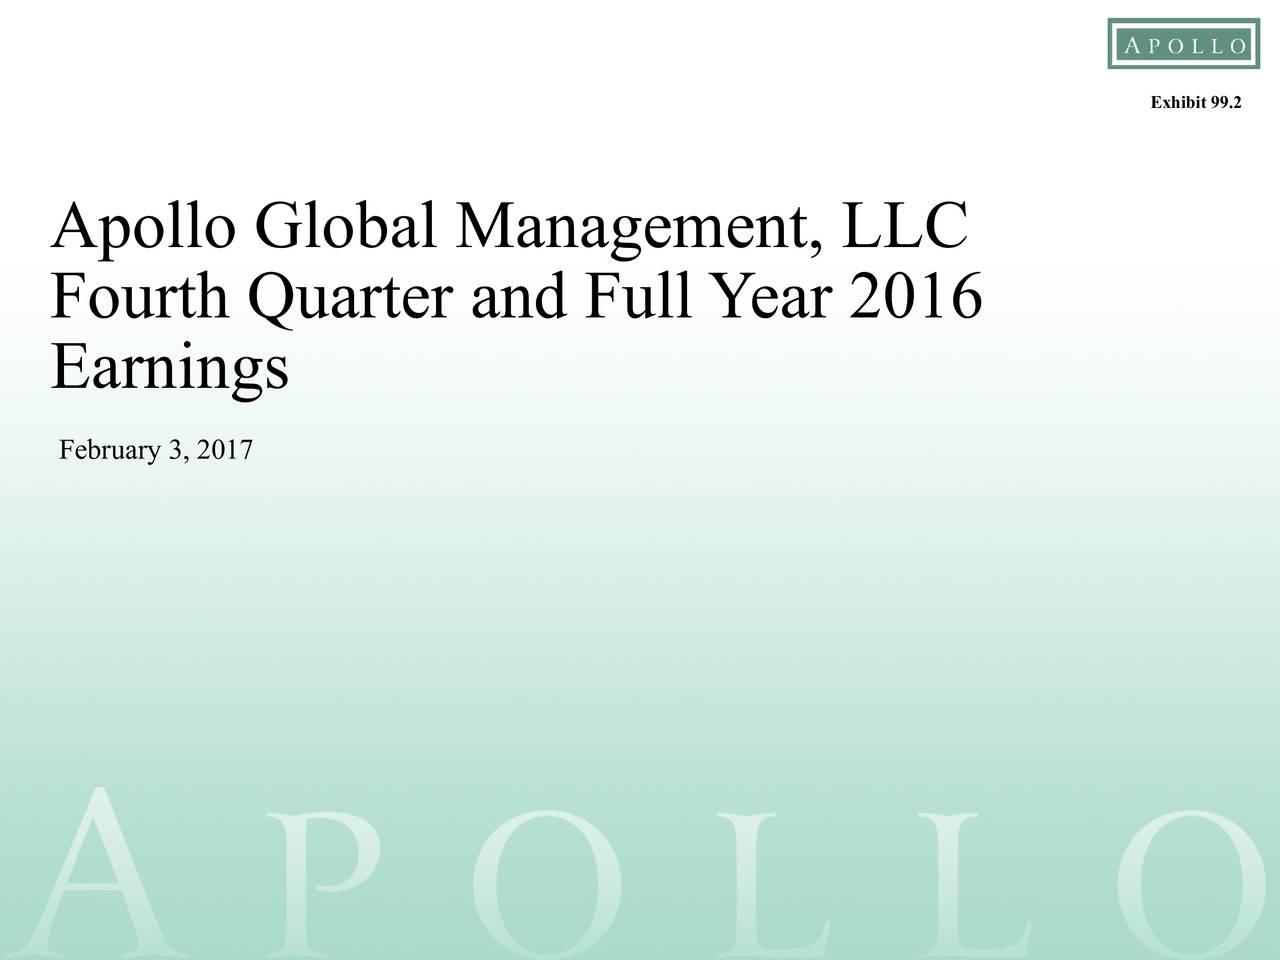 Apollo Global Management, LLC Fourth Quarter and Full Y ear 2016 Earnings February3, 2017